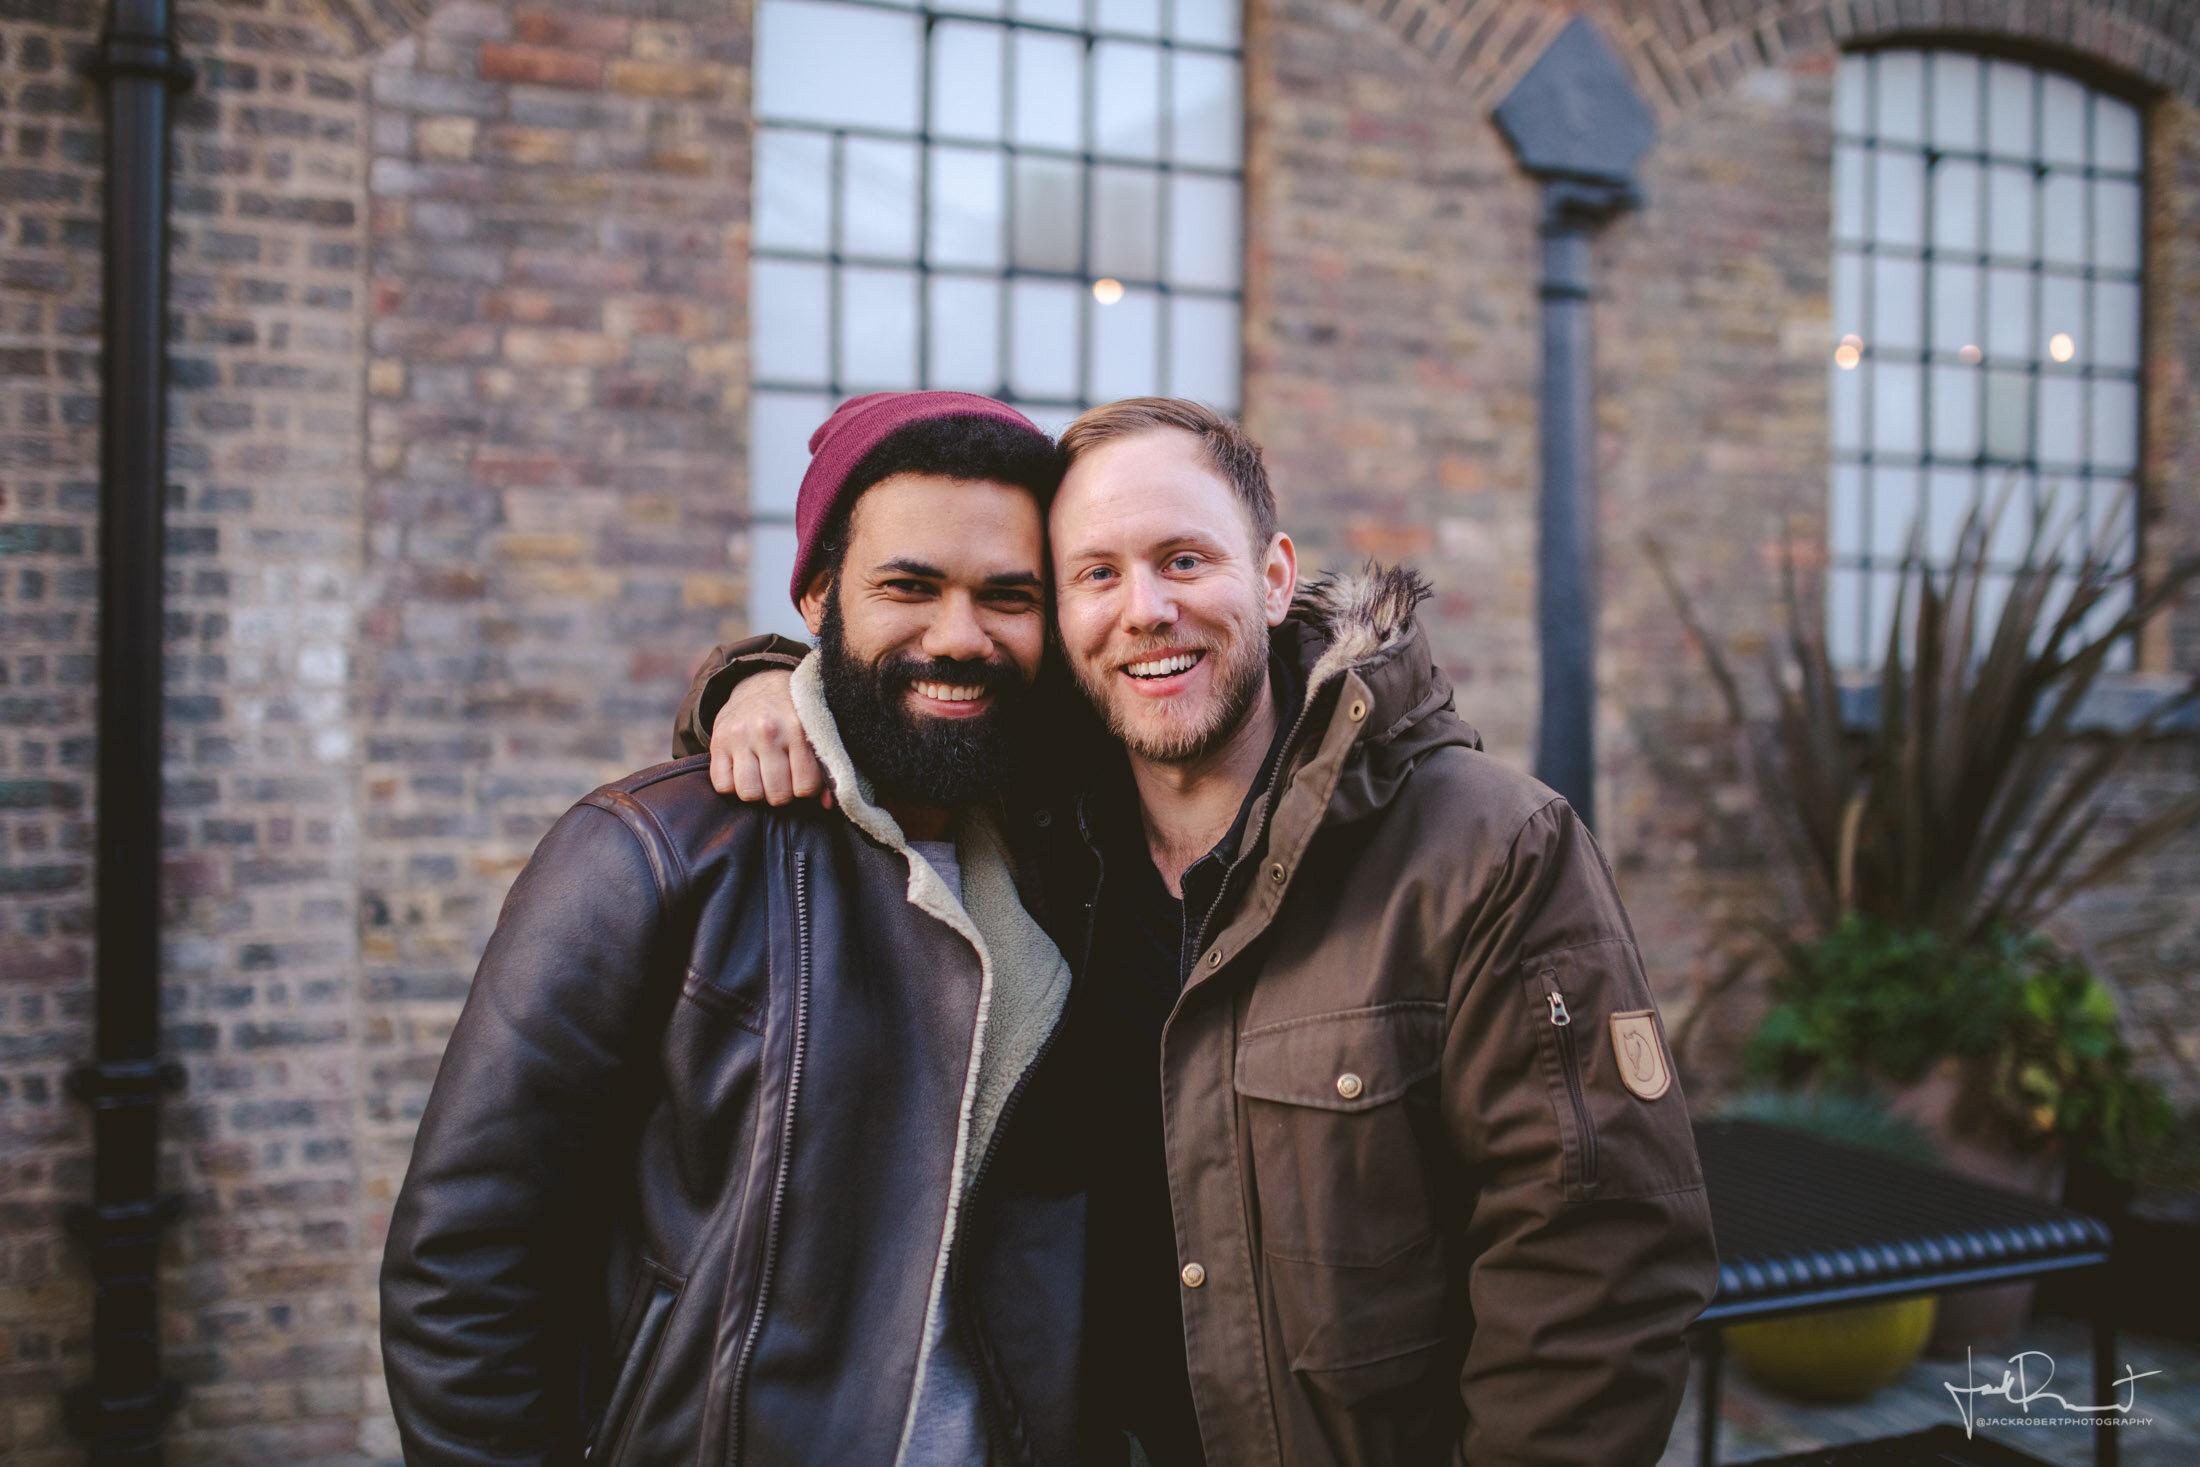 2020-01-18 London, UK - Jack Robert Photography (80 of 112).jpg